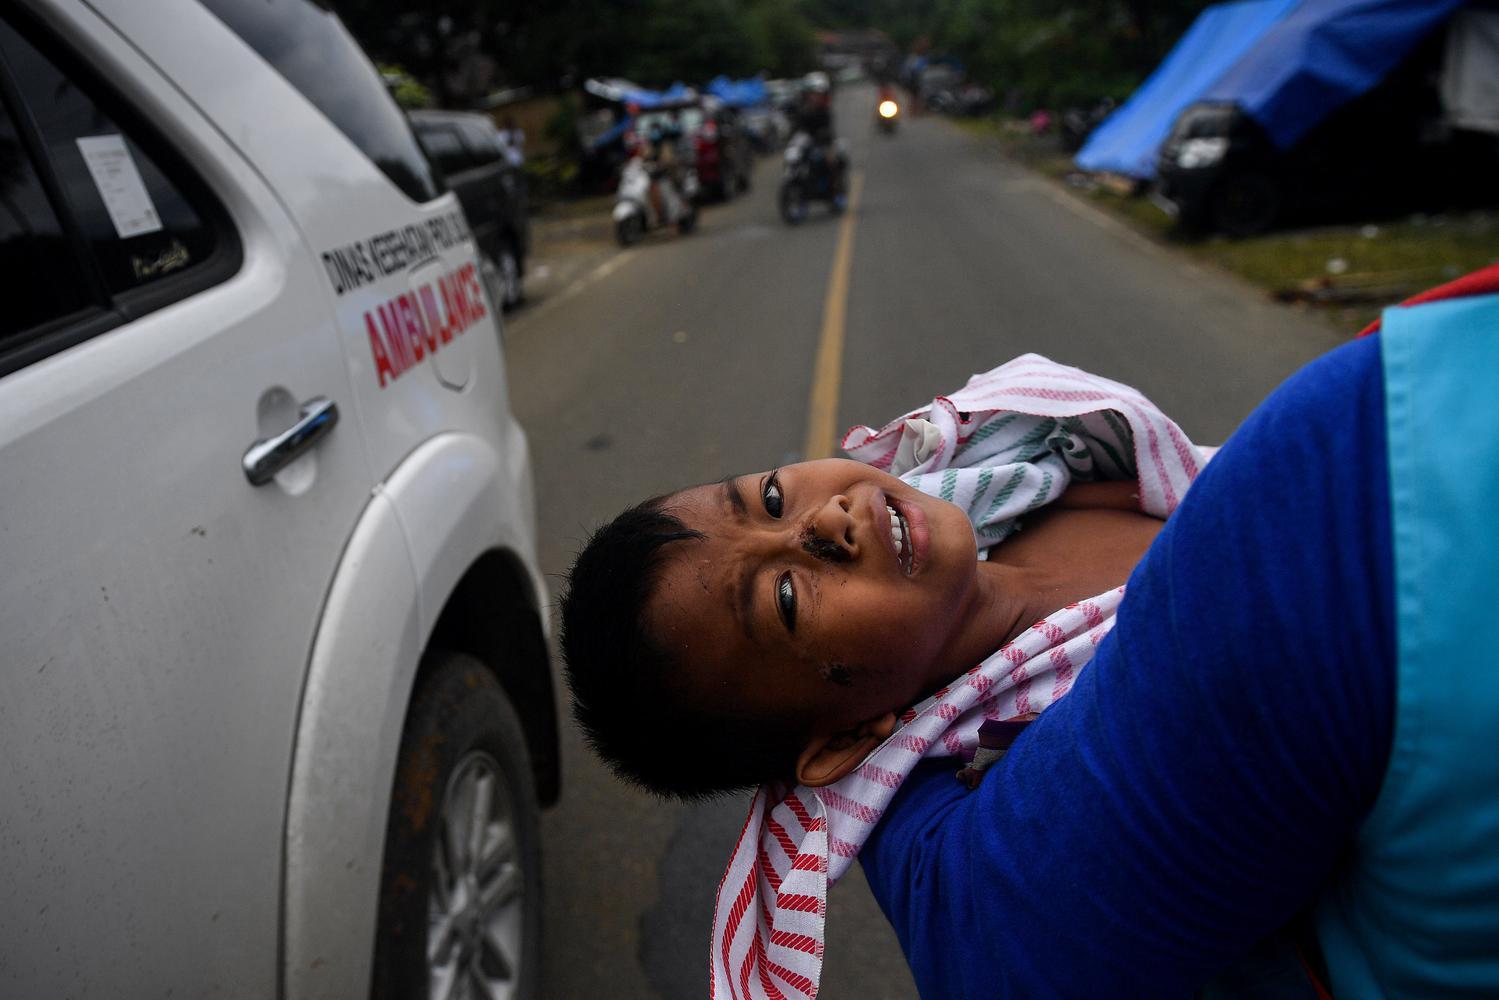 Tim medis membawa Syahgani (6), warga Desa Orobatu yang terluka karena tertimpa puing dampak gempa bumi di Tapalang, Mamuju, Sulawesi Barat, Rabu (20/1/2021). Syahgani dan ibunya Nurliati dirujuk ke rumah sakit untuk mendapatkan perawatan lebih lanjut, sementara ayahnya meninggal dunia saat gempa magnitudo 6,2 mengguncang daerah tersebut.